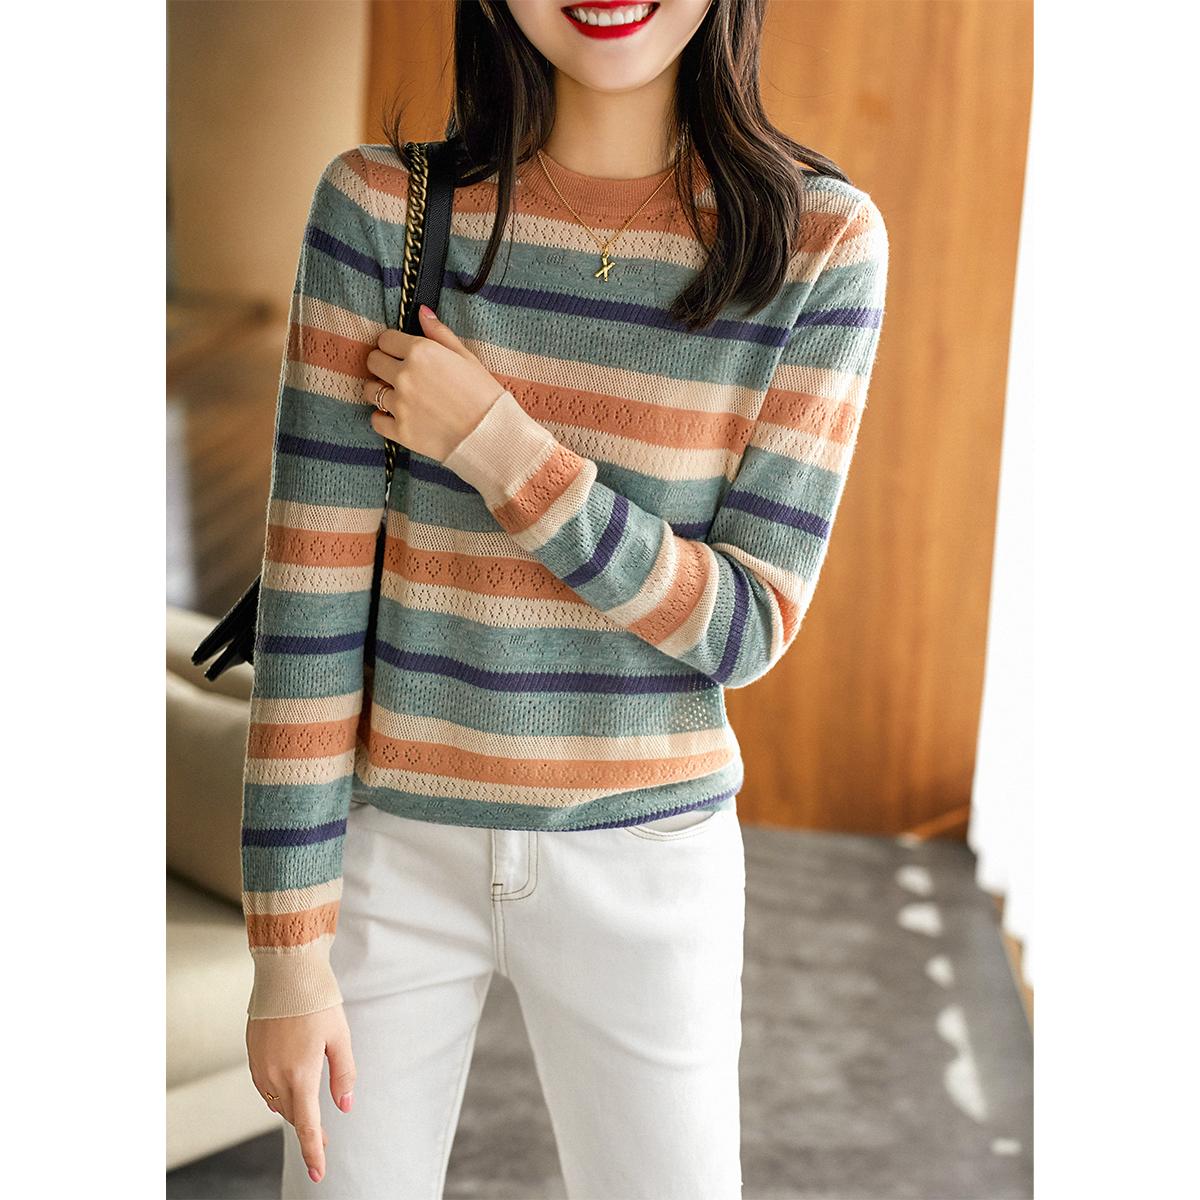 [ZY259141AG]笑涵阁 柜面精品系列 全羊毛彩色条纹针织衫